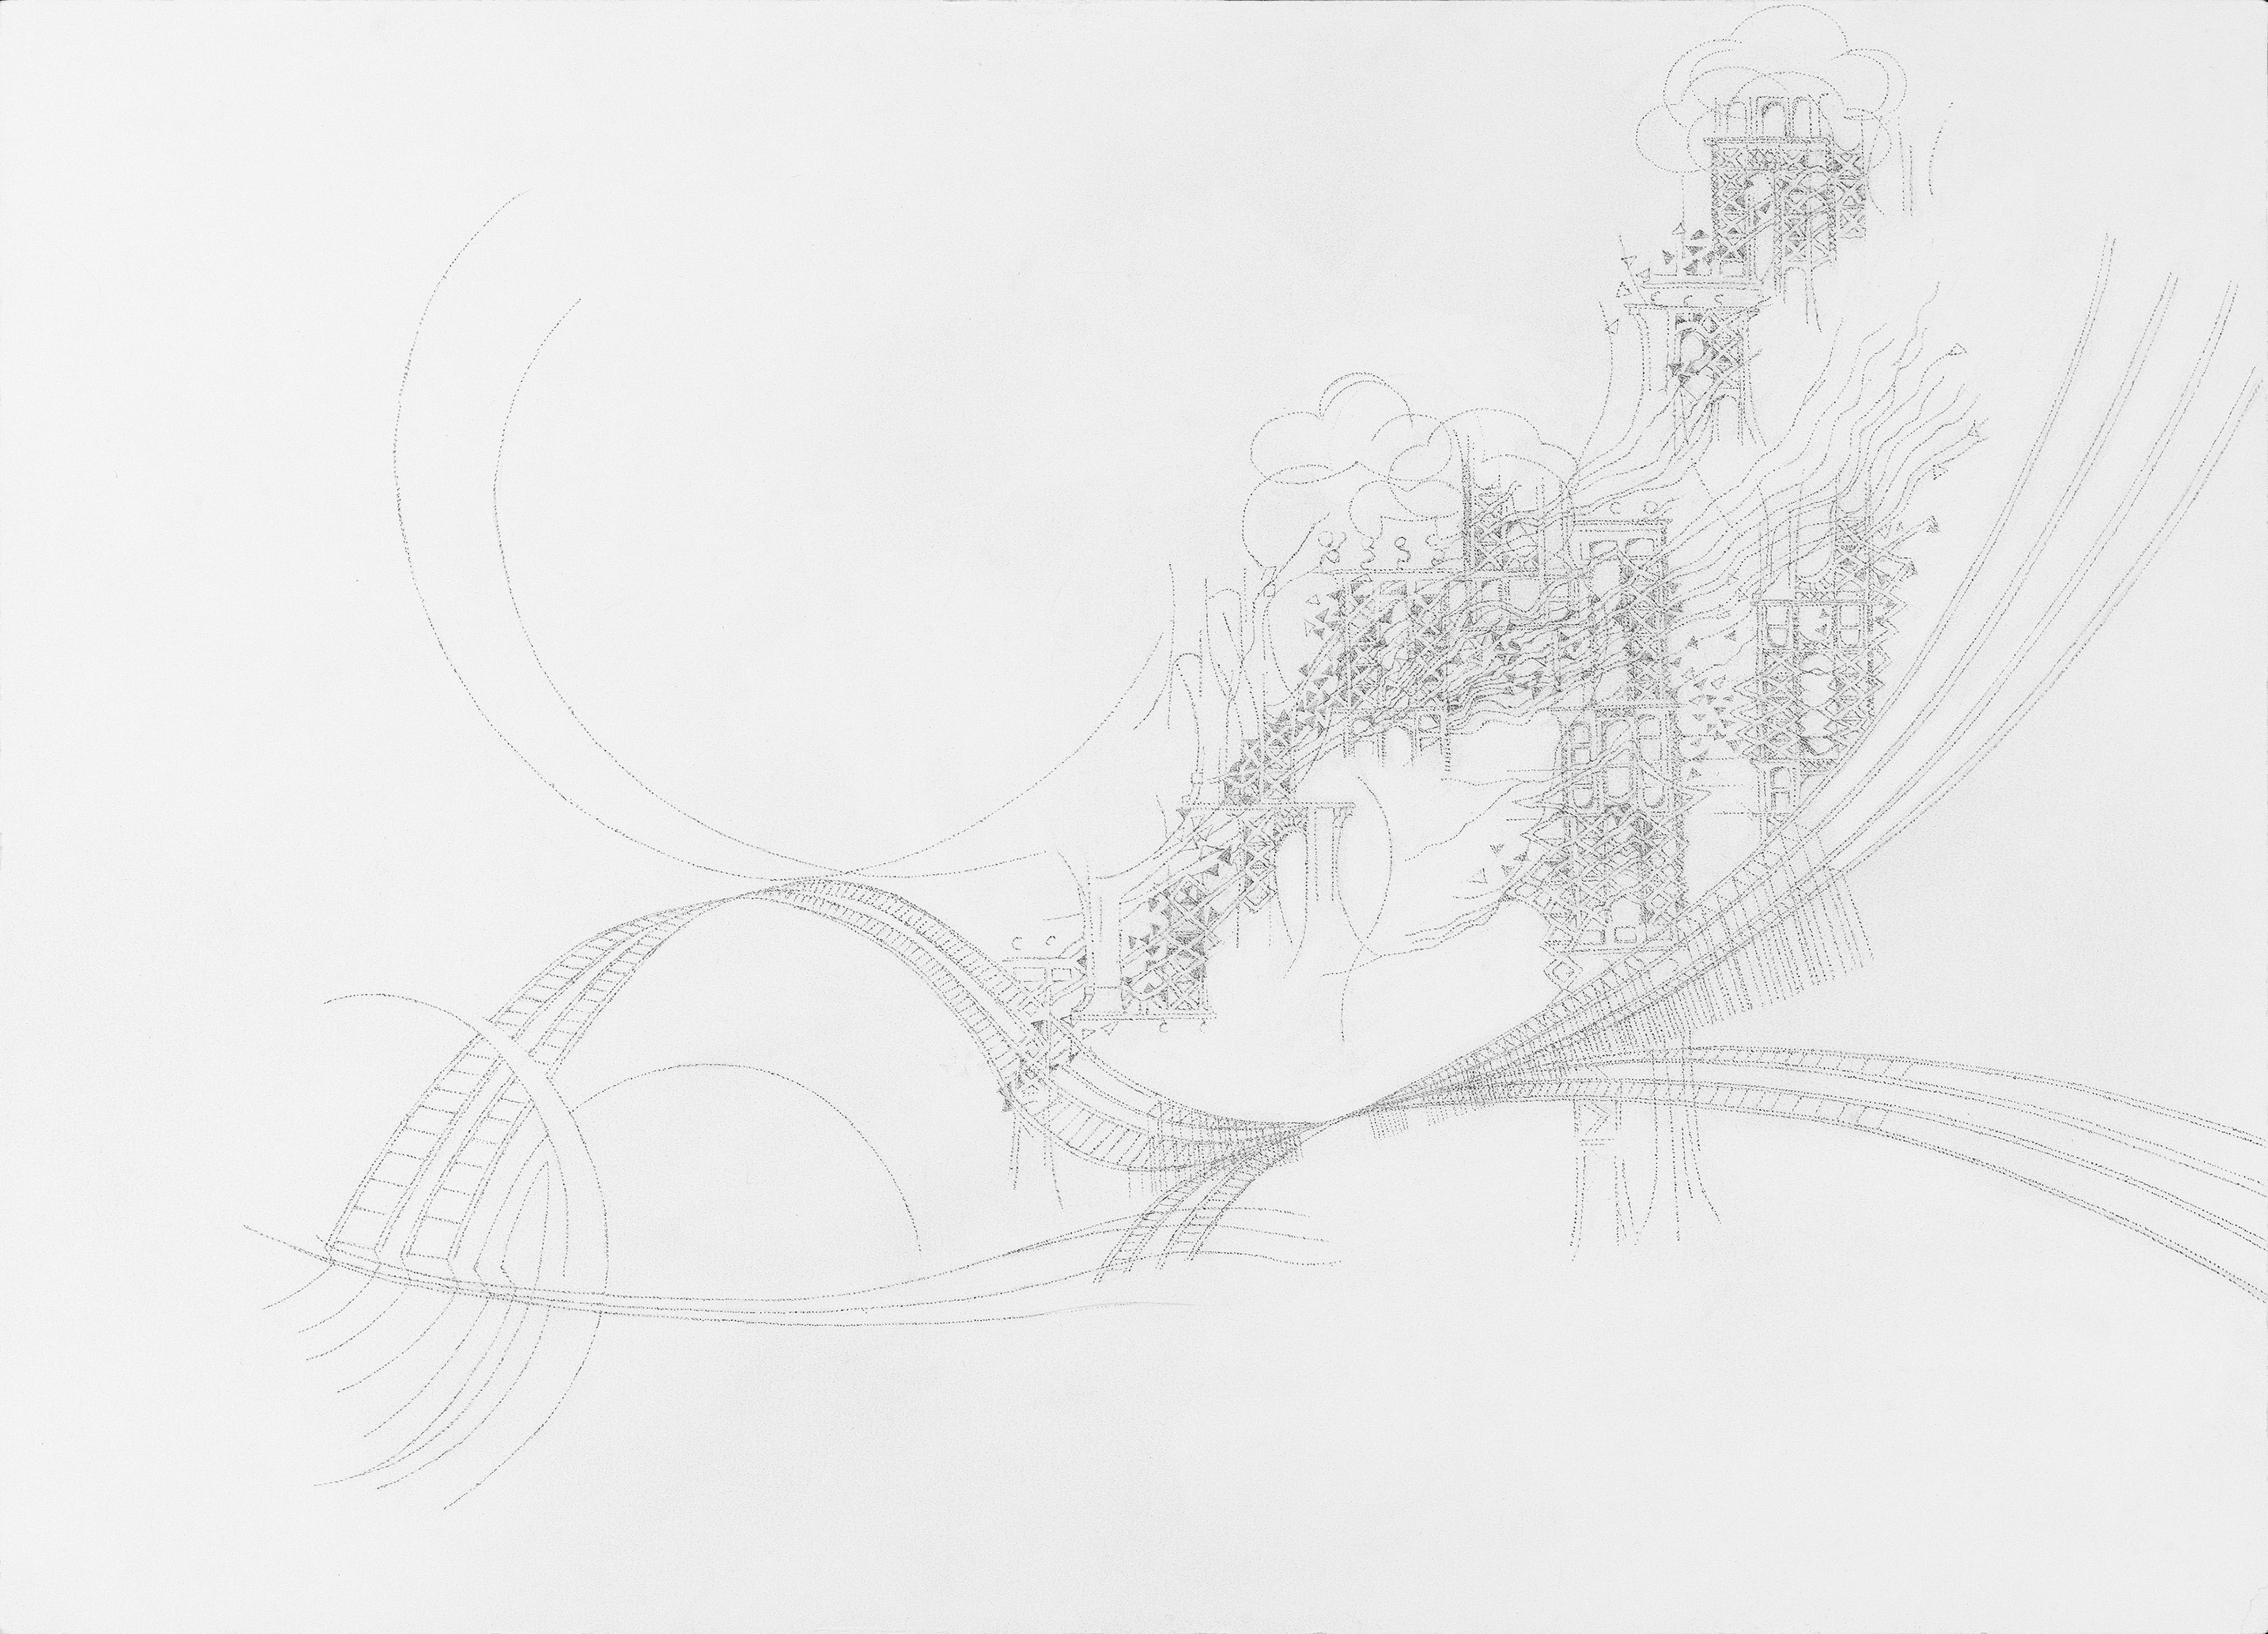 Katherine Jackson, Suspension of Disbelief II, 2015, Graphite, Paper, Framed